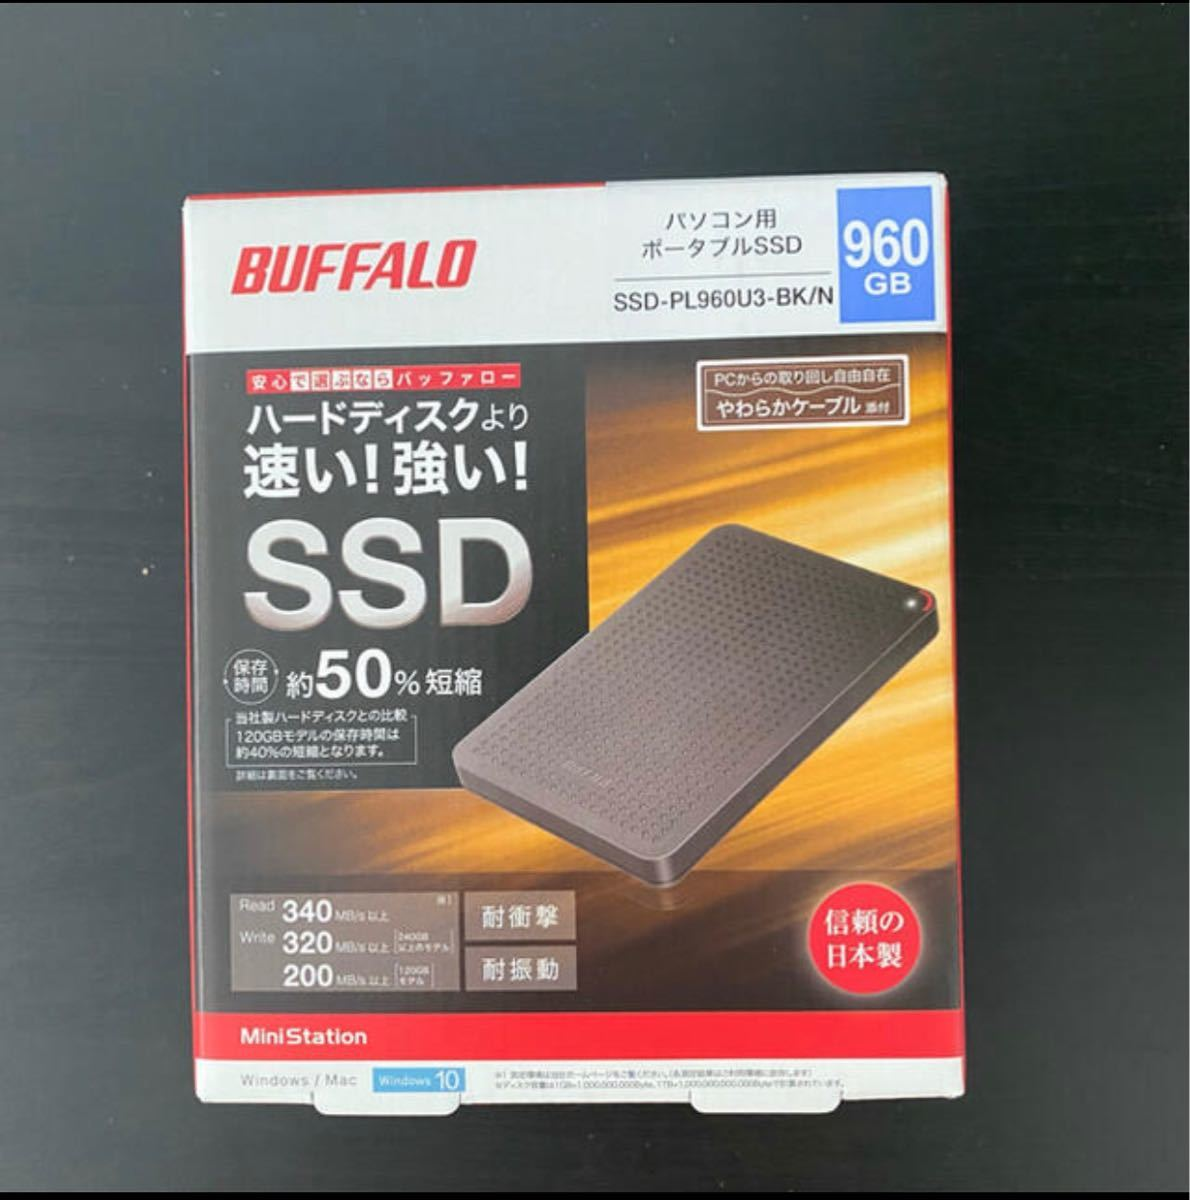 【新品未開封】BUFFALO ポータブルSSD 960GB SSD-PL960U3-BK/N 納品書付